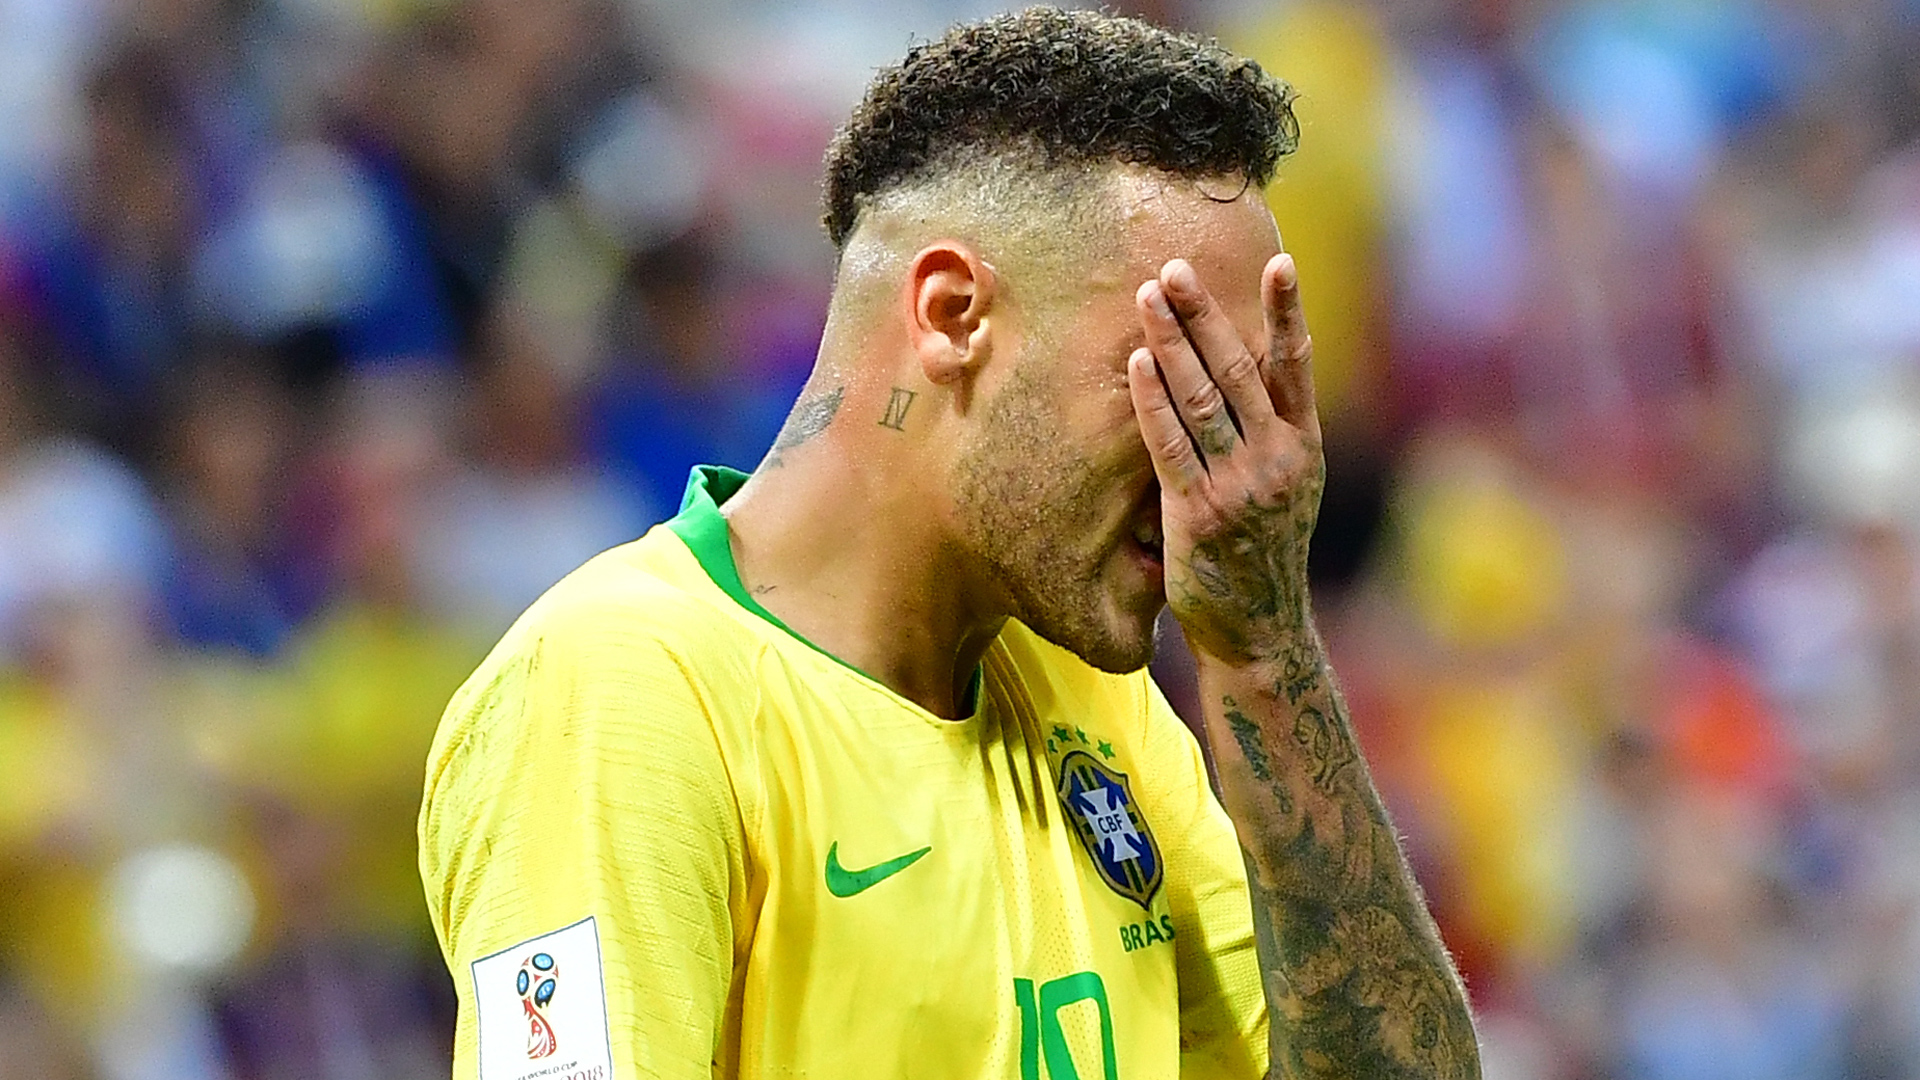 Neymar admitió que exageró las faltas en Rusia